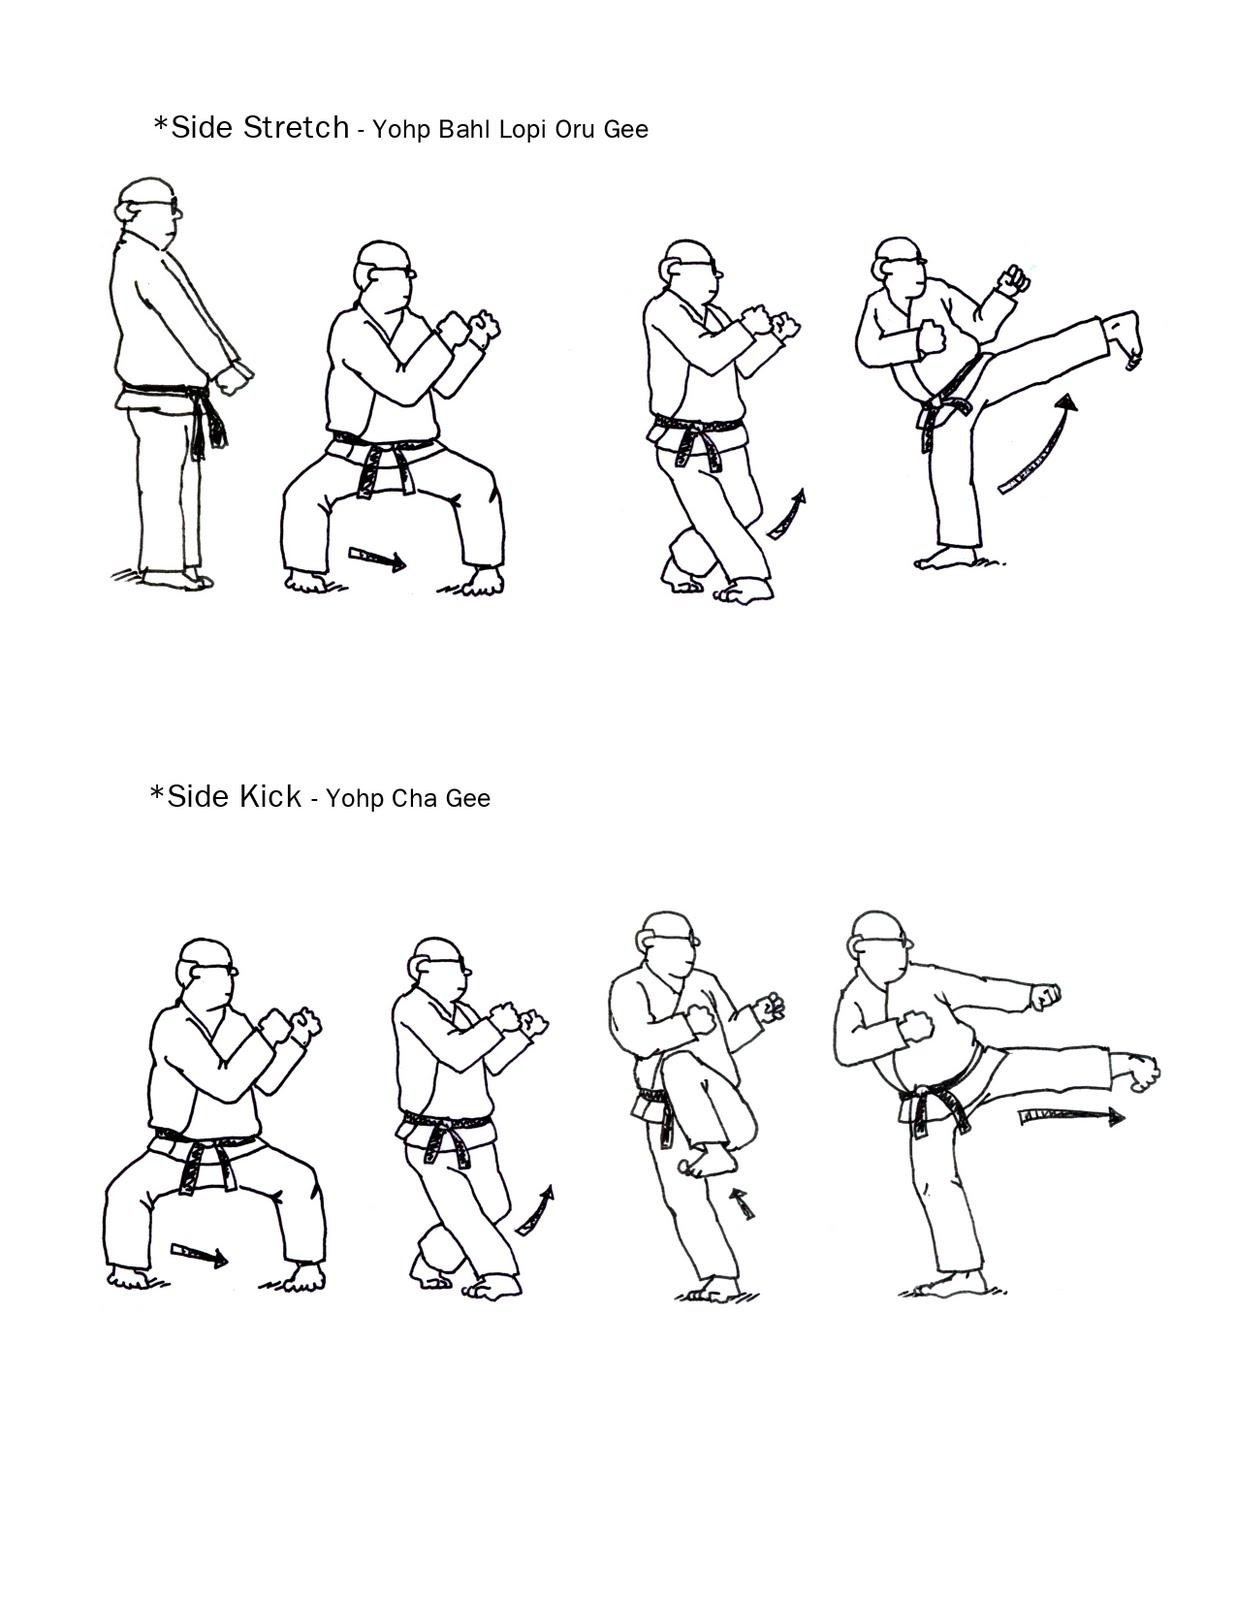 Karate Clipart Karate Tiger Taekwondo Coloring Pages Image ... | 1600x1236